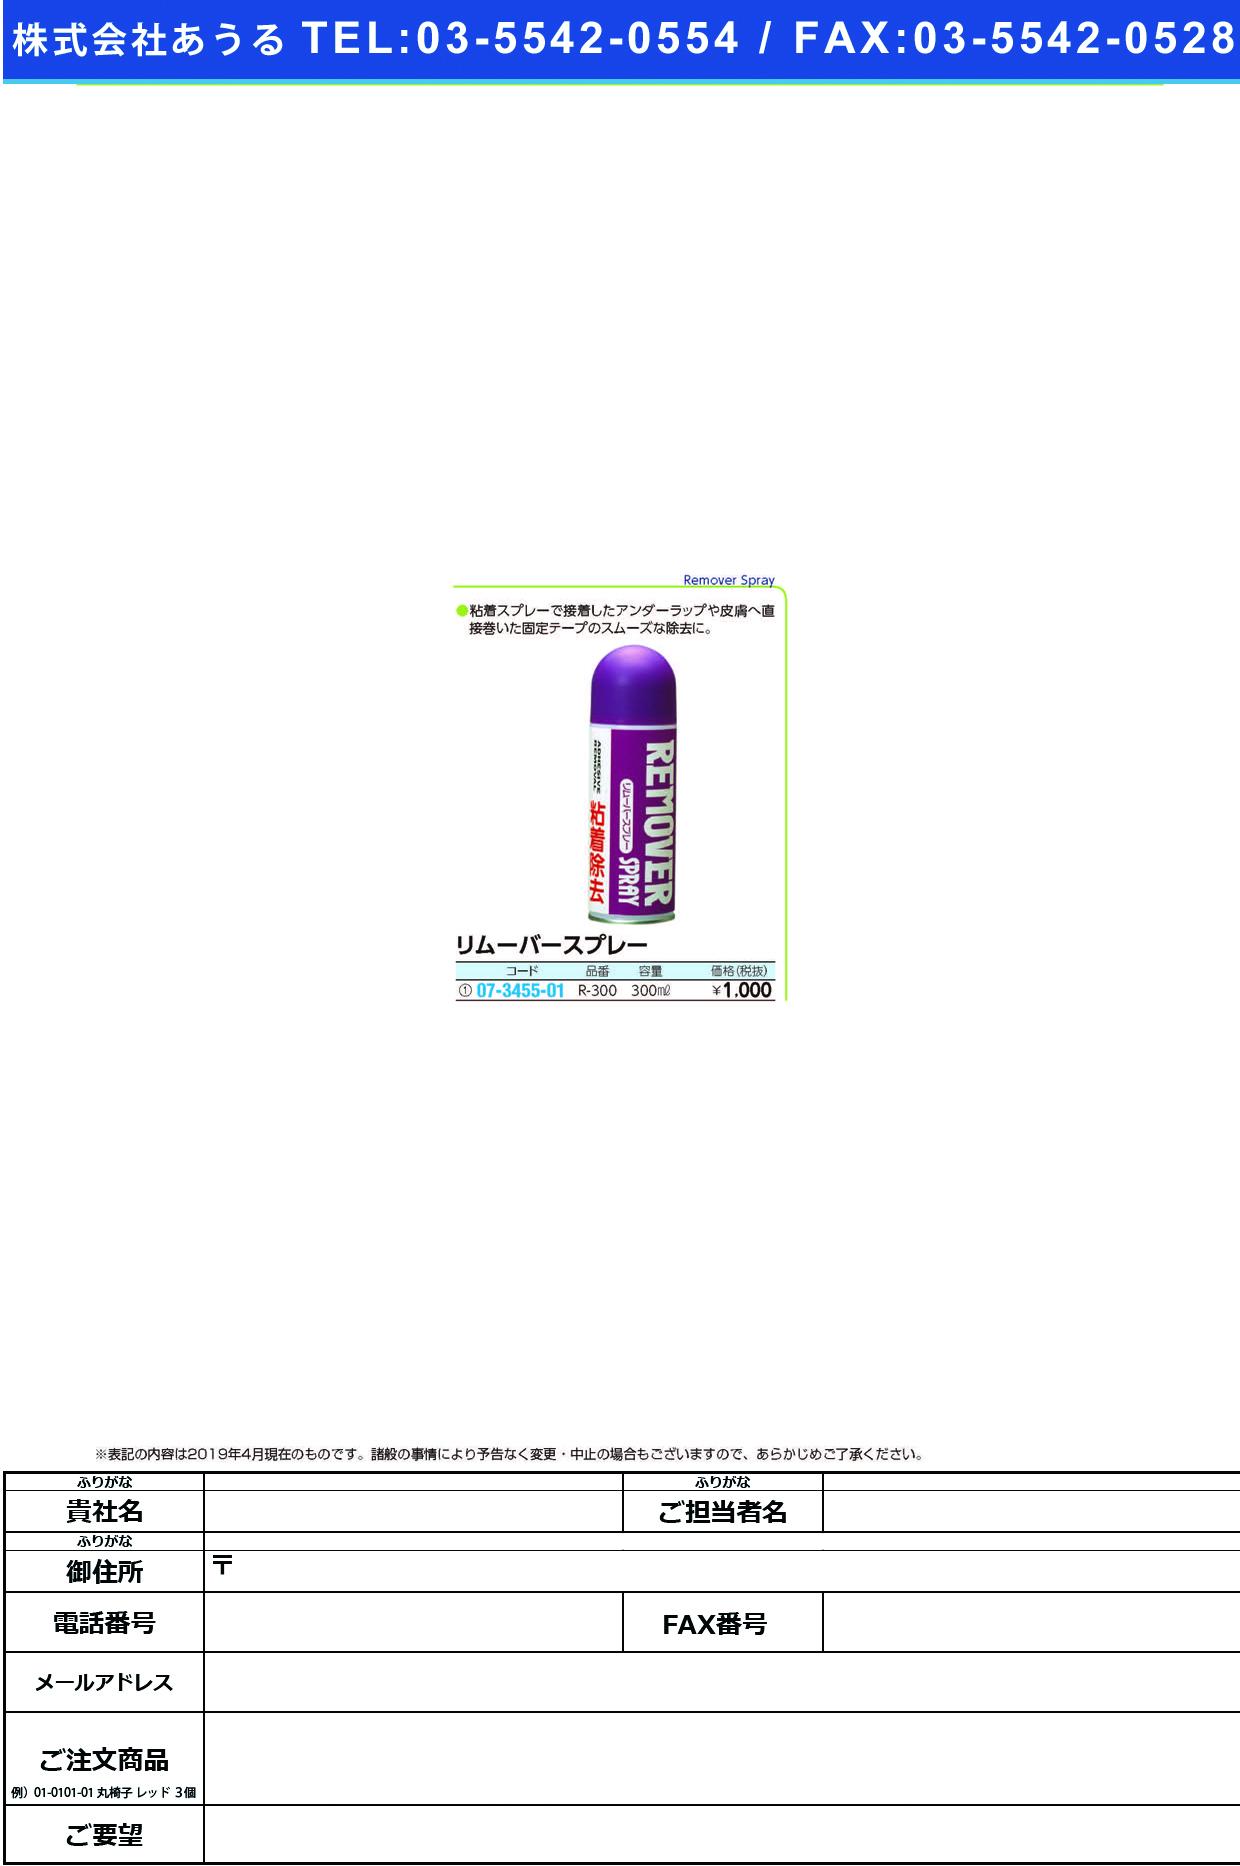 (07-3455-01)BWリムーバースプレー R-300(300ML) BWリムーバースプレー(ニチバン)【1本単位】【2019年カタログ商品】